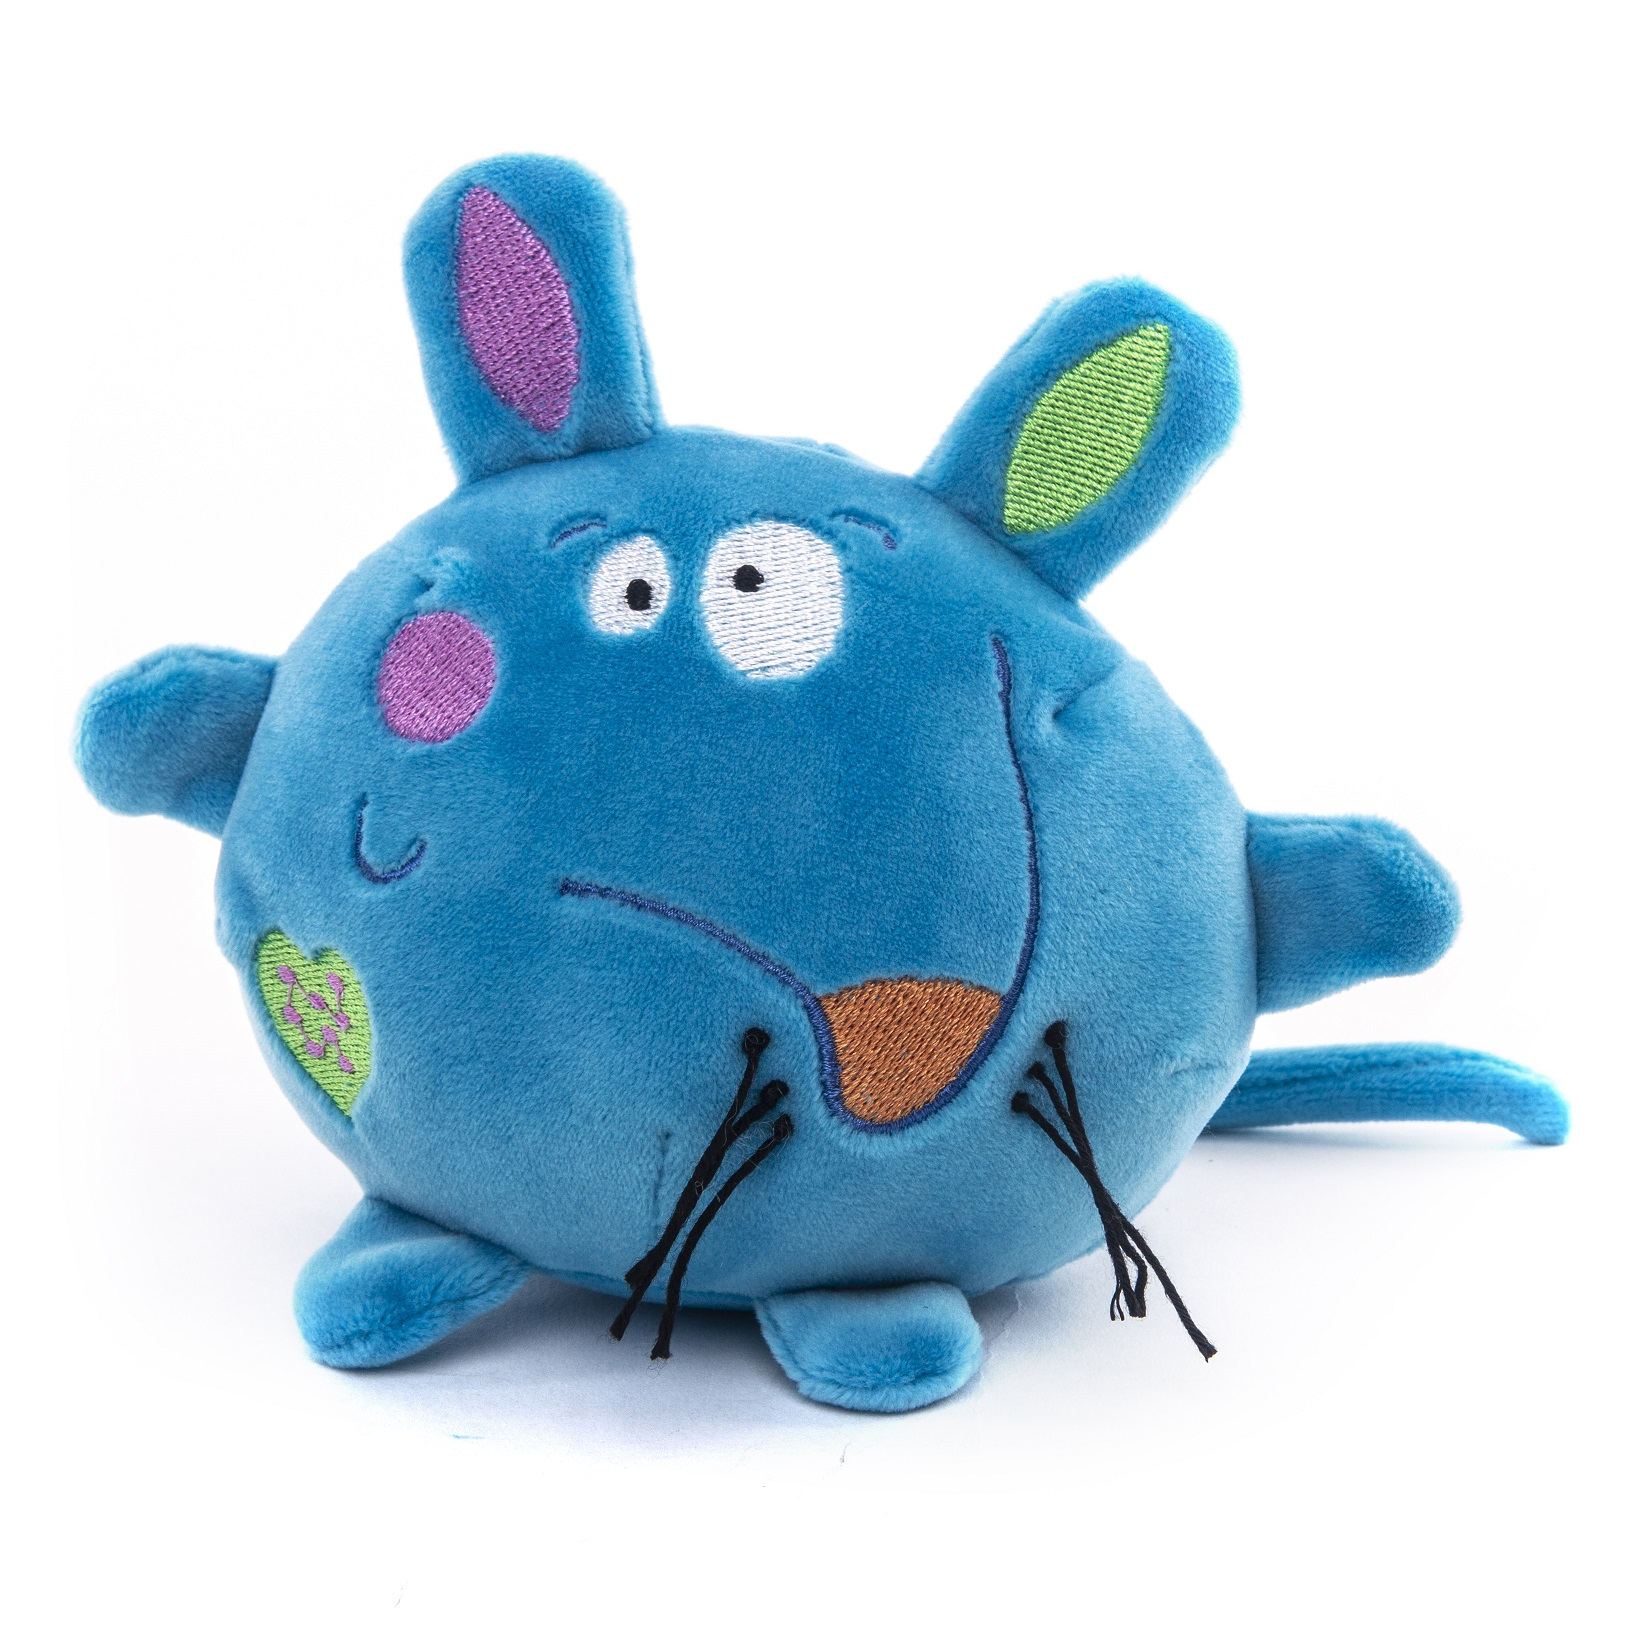 Button Blue мягкая игрушка Мышка синяя